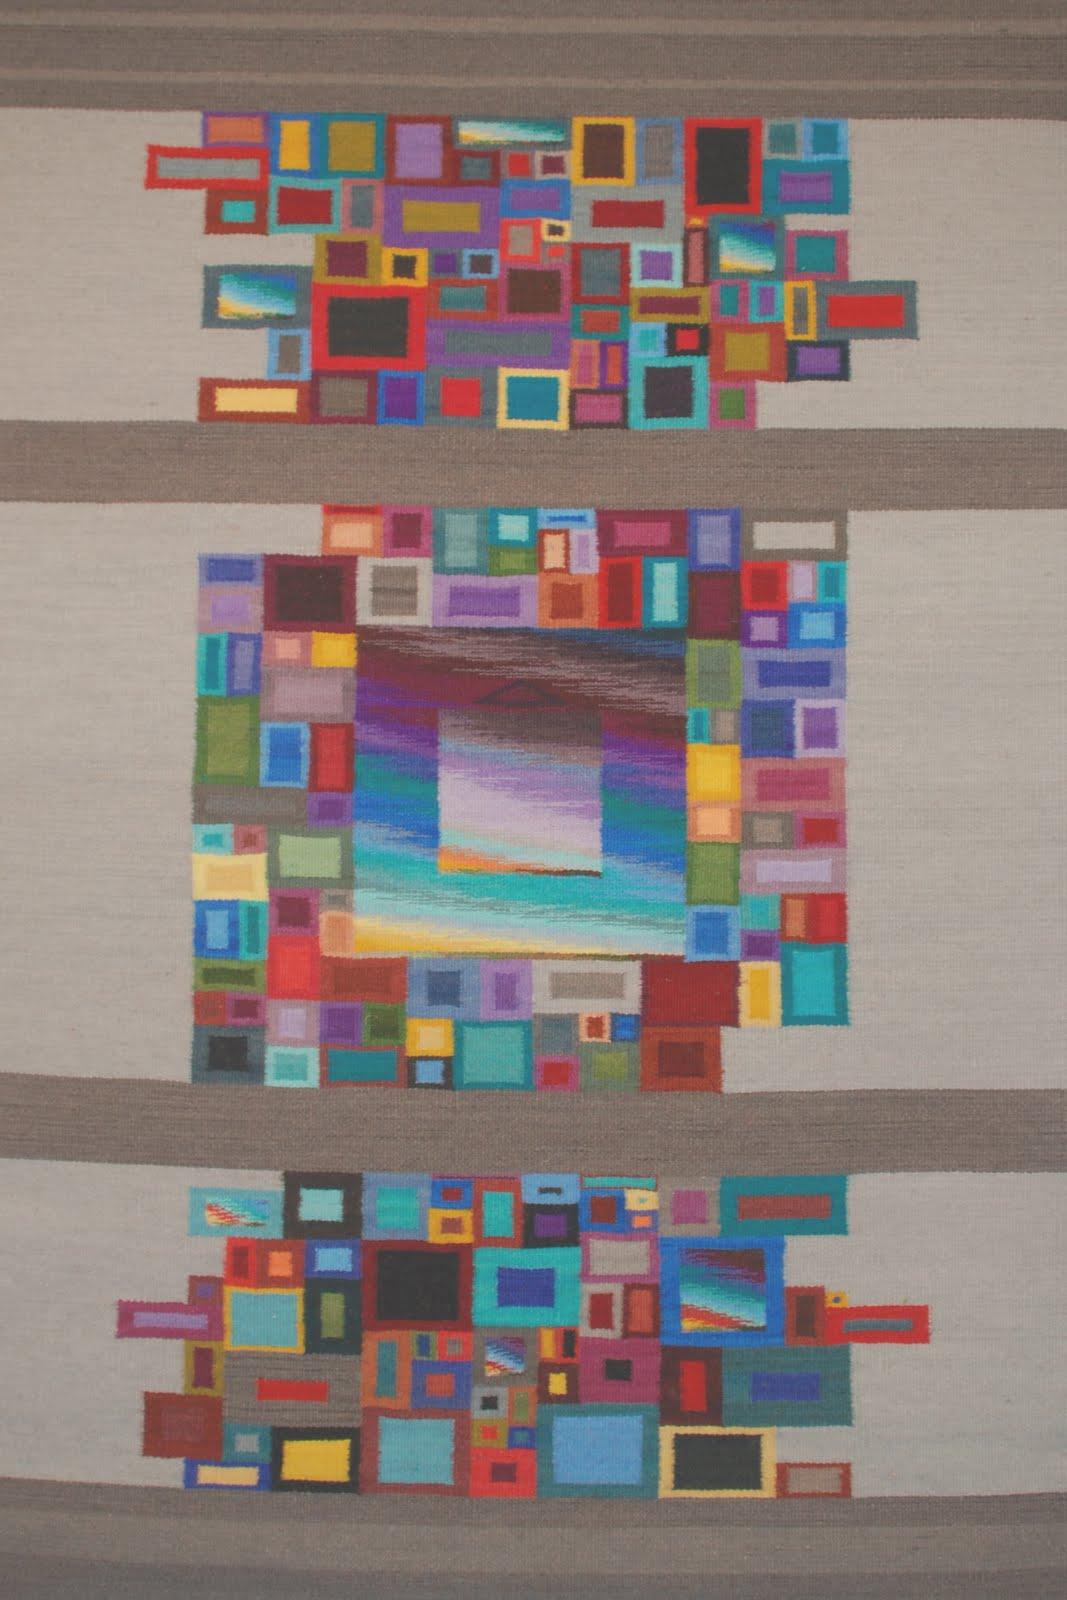 [Color+Fractal+Series+]